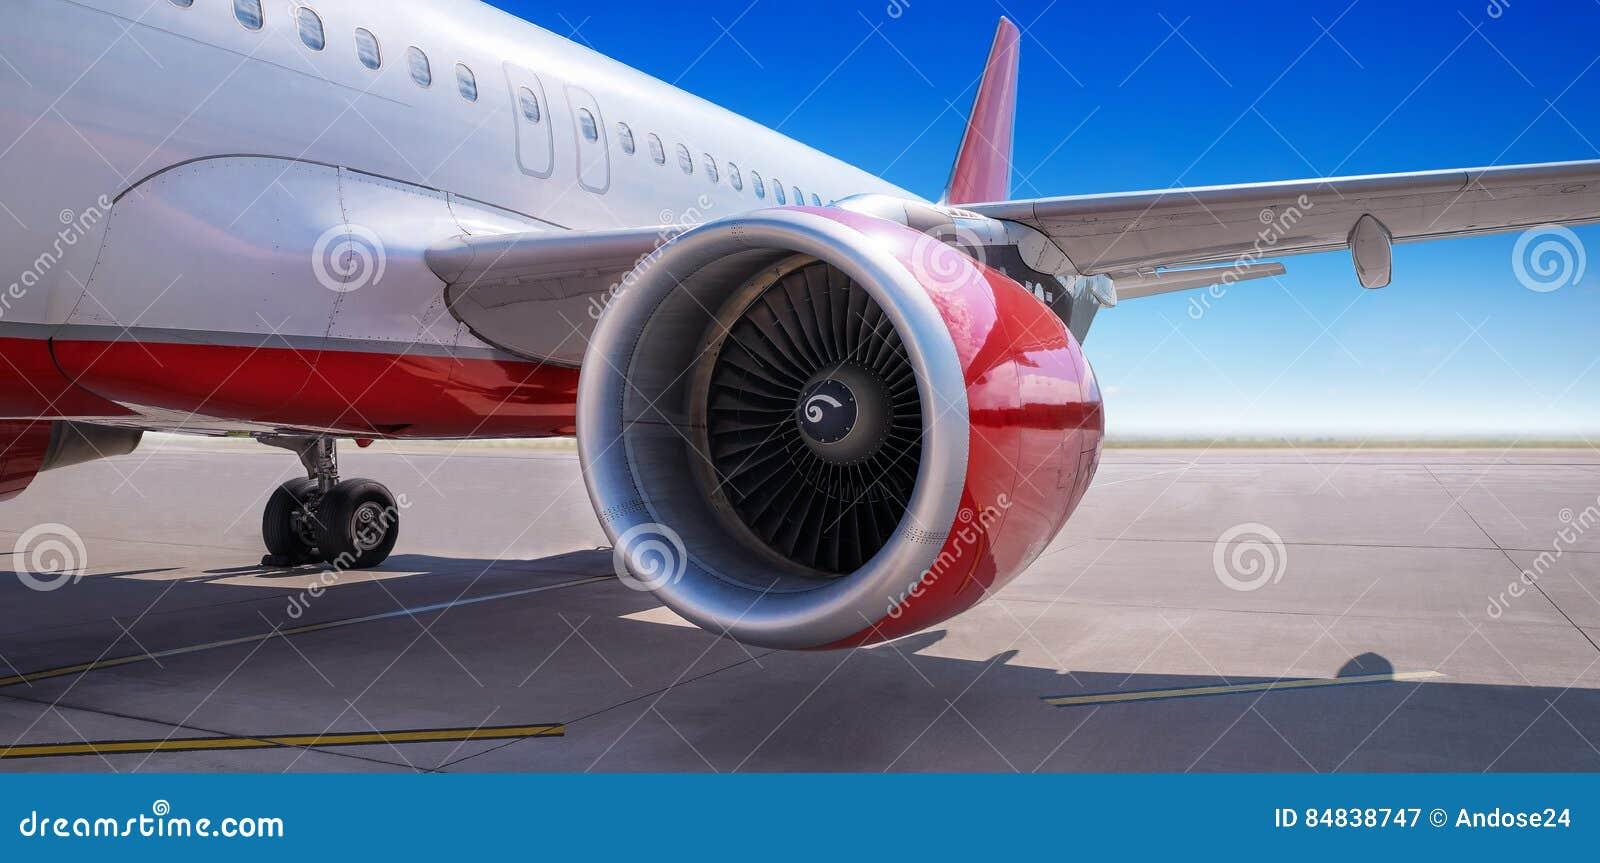 Turbine eines Passagierflugzeugs